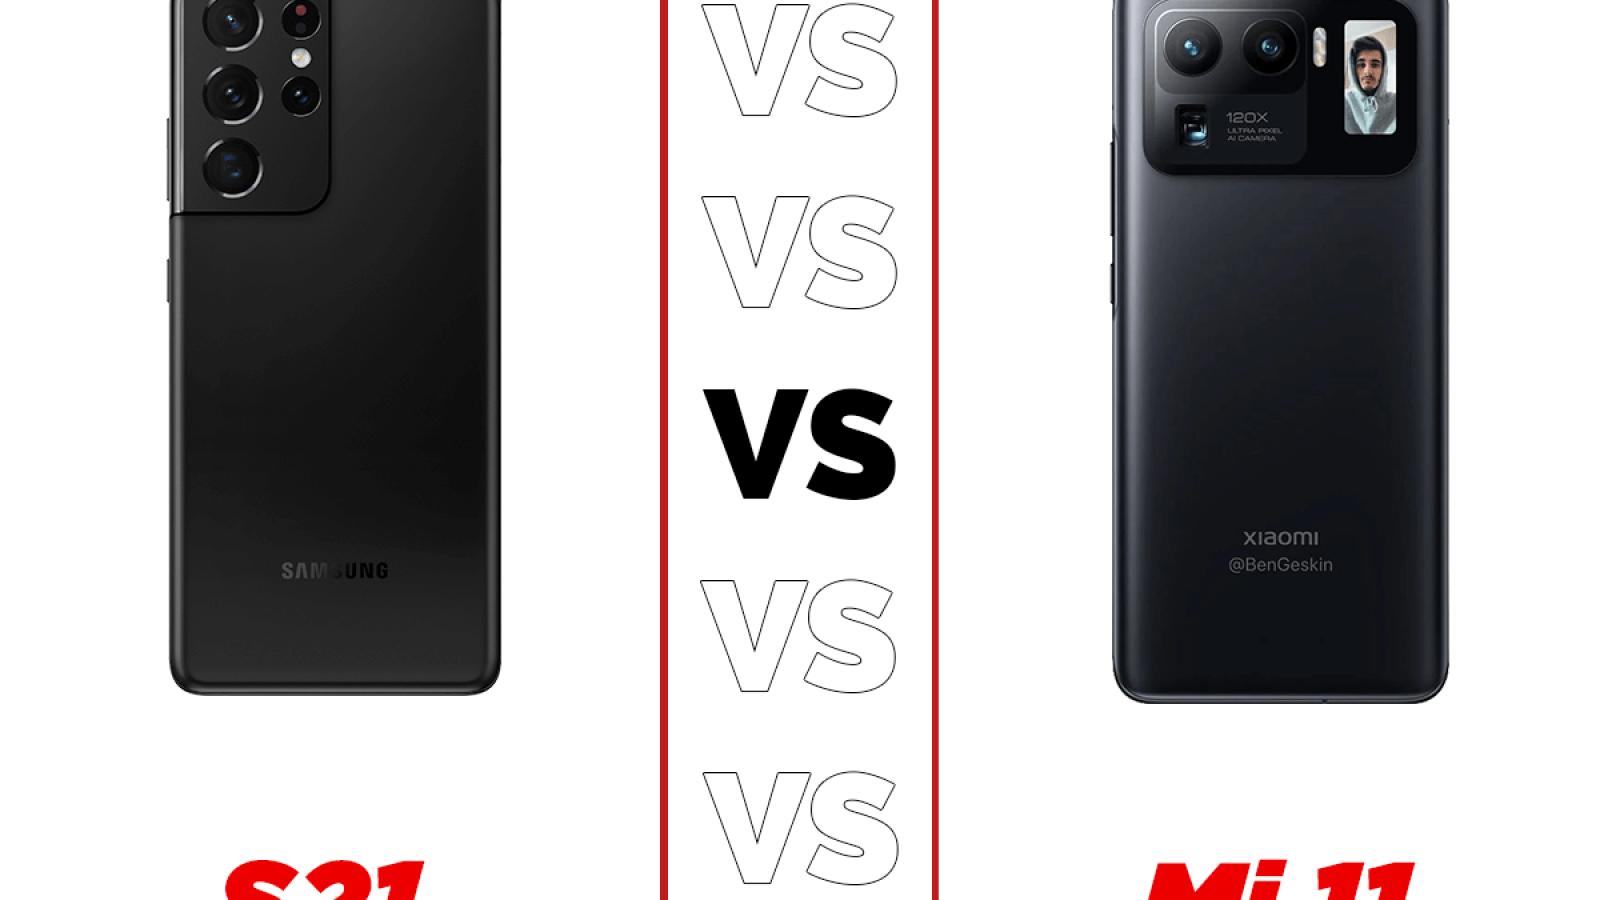 TB-Samsung-S21-Ultra-versus-Xiaomi-Mi-11-Ultra-Cuadrado